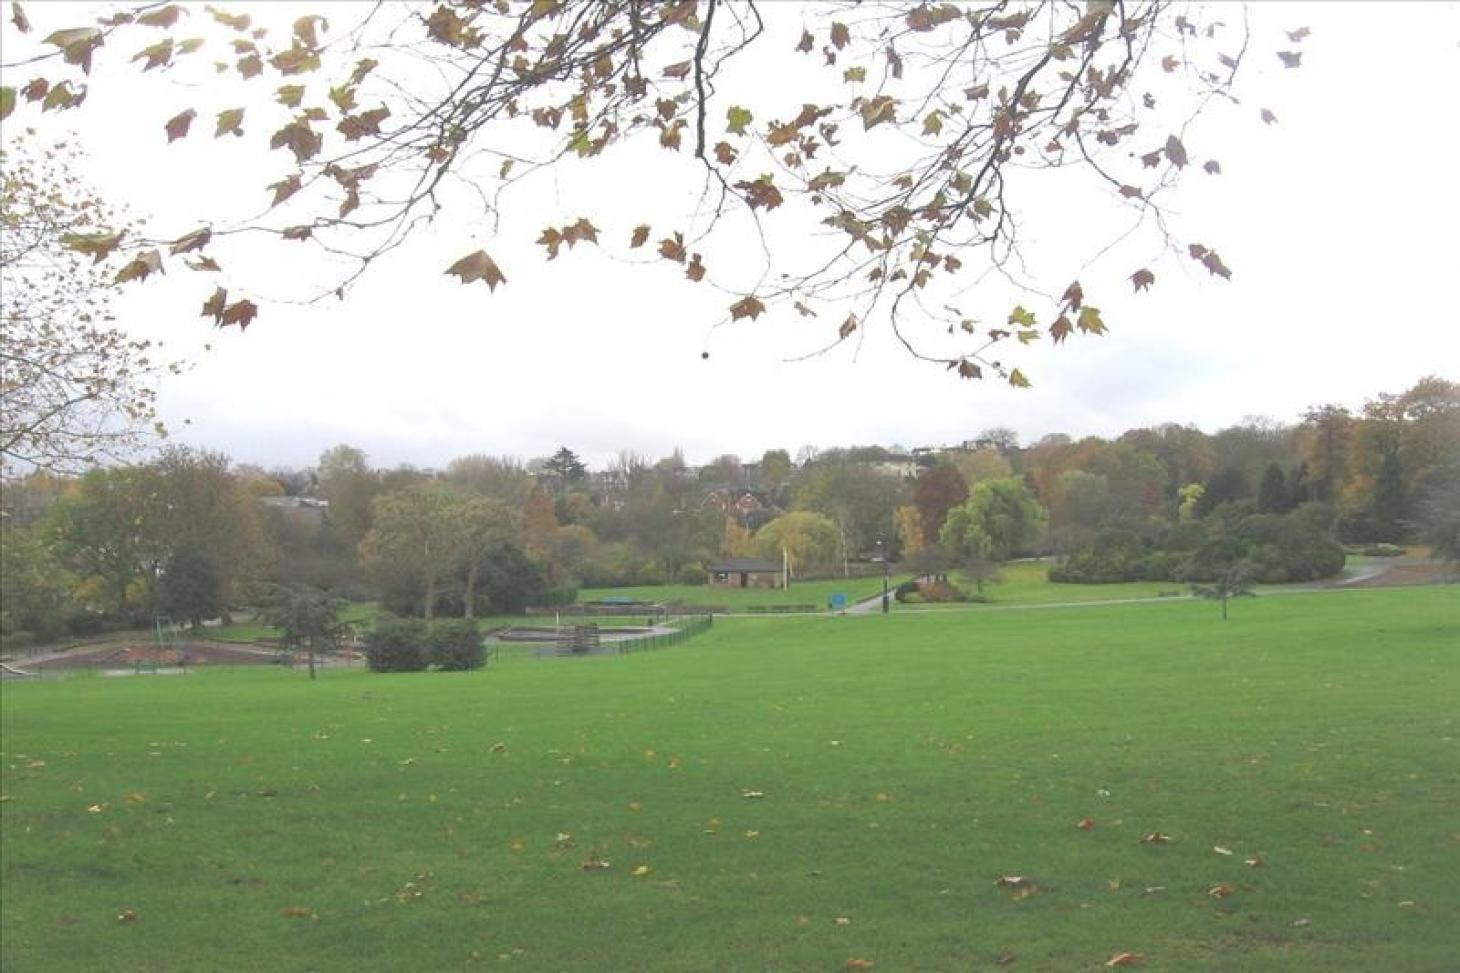 Sydenham Wells Park Outdoor | Hard (macadam) tennis court